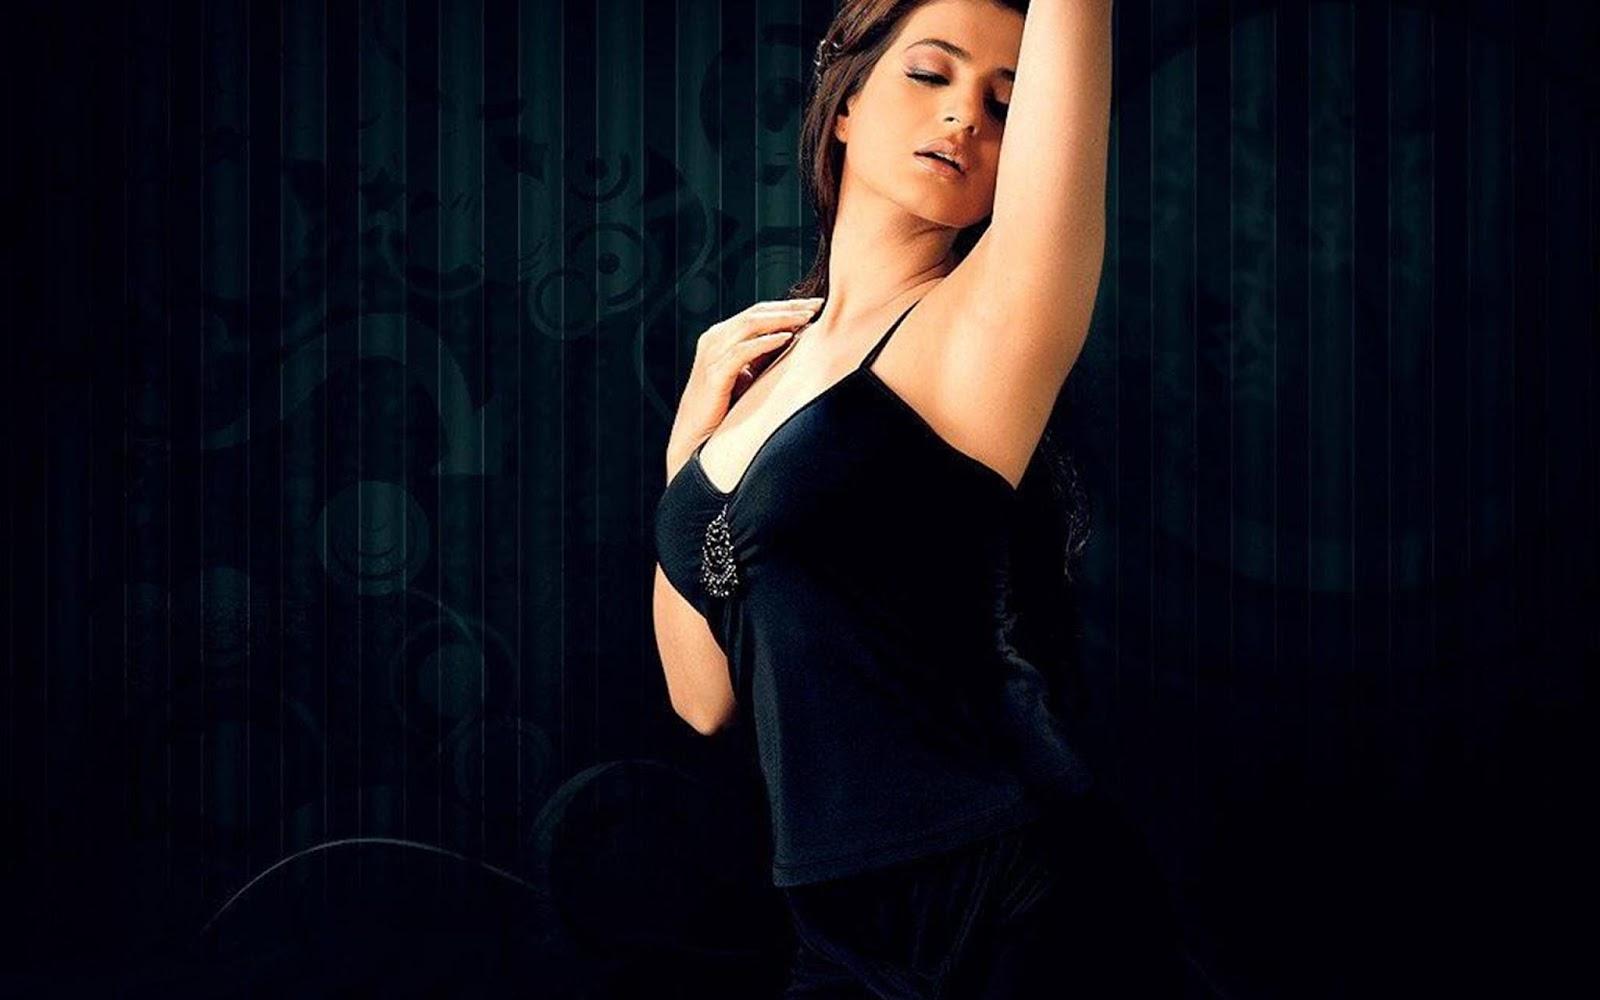 Amisha Patel Hot Wallpapers  Bikini Pics - Hd Images 1080P-4076